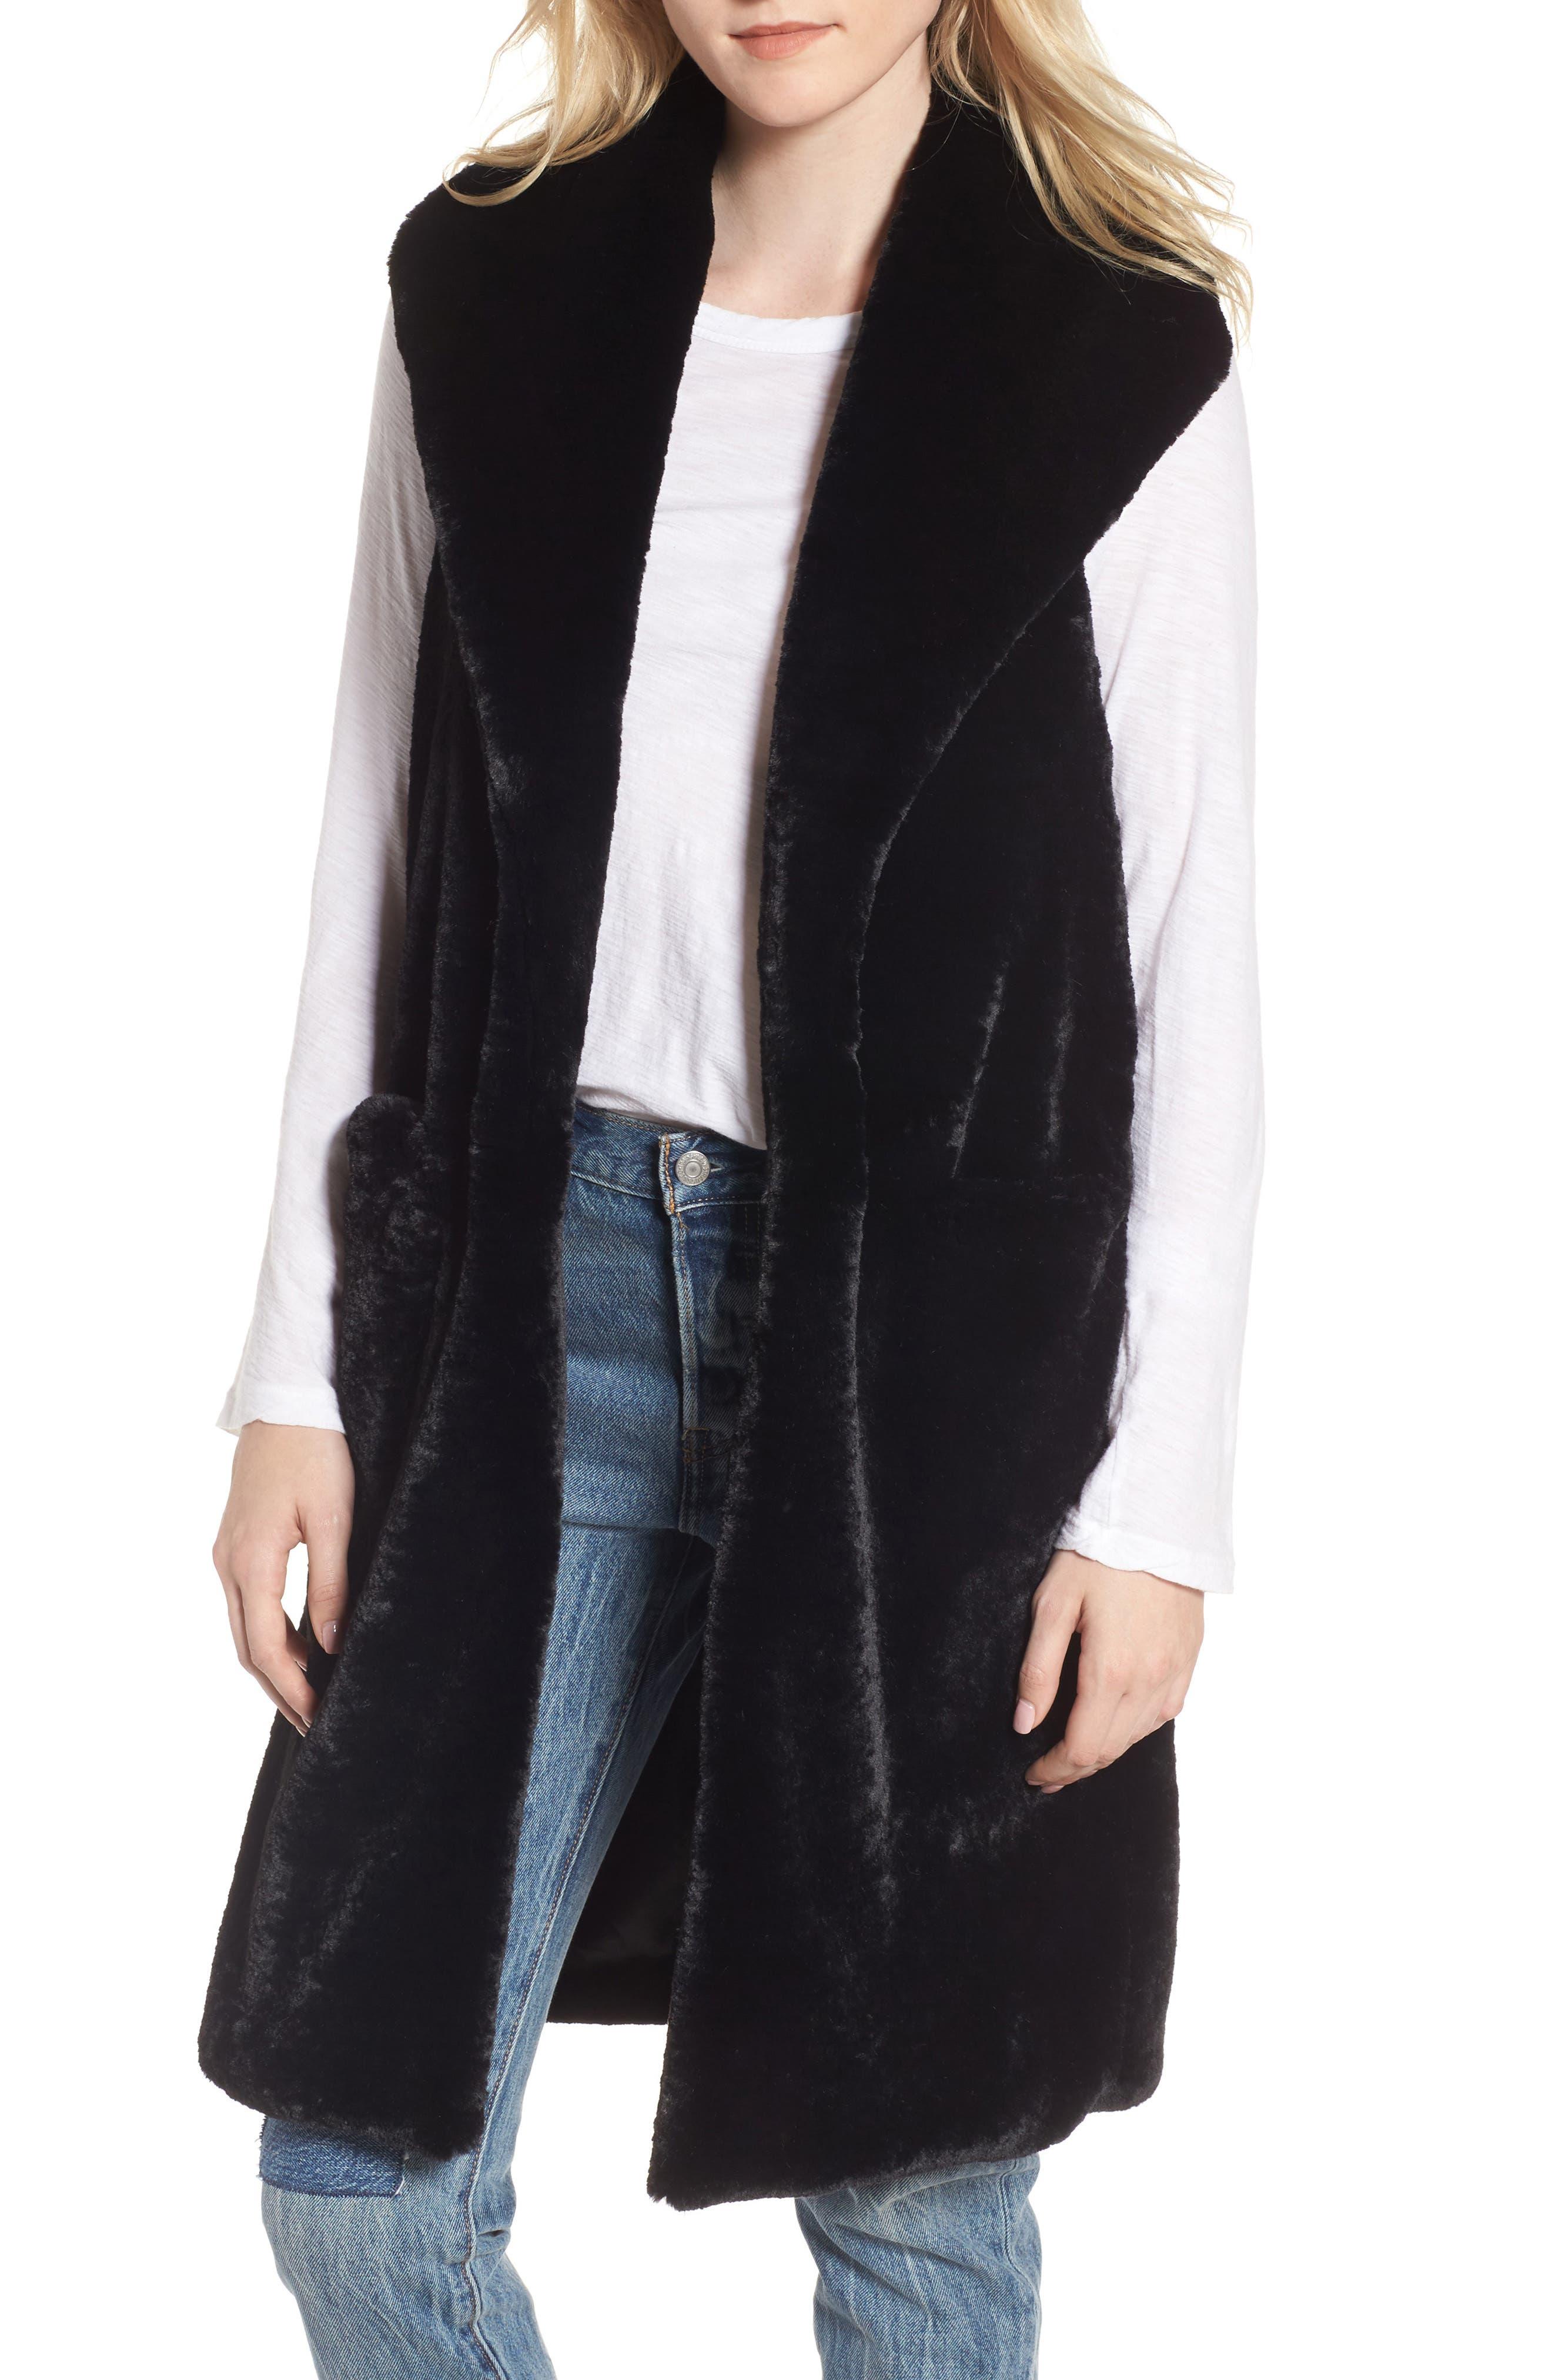 Heurueh Heather Faux Mink Fur Vest